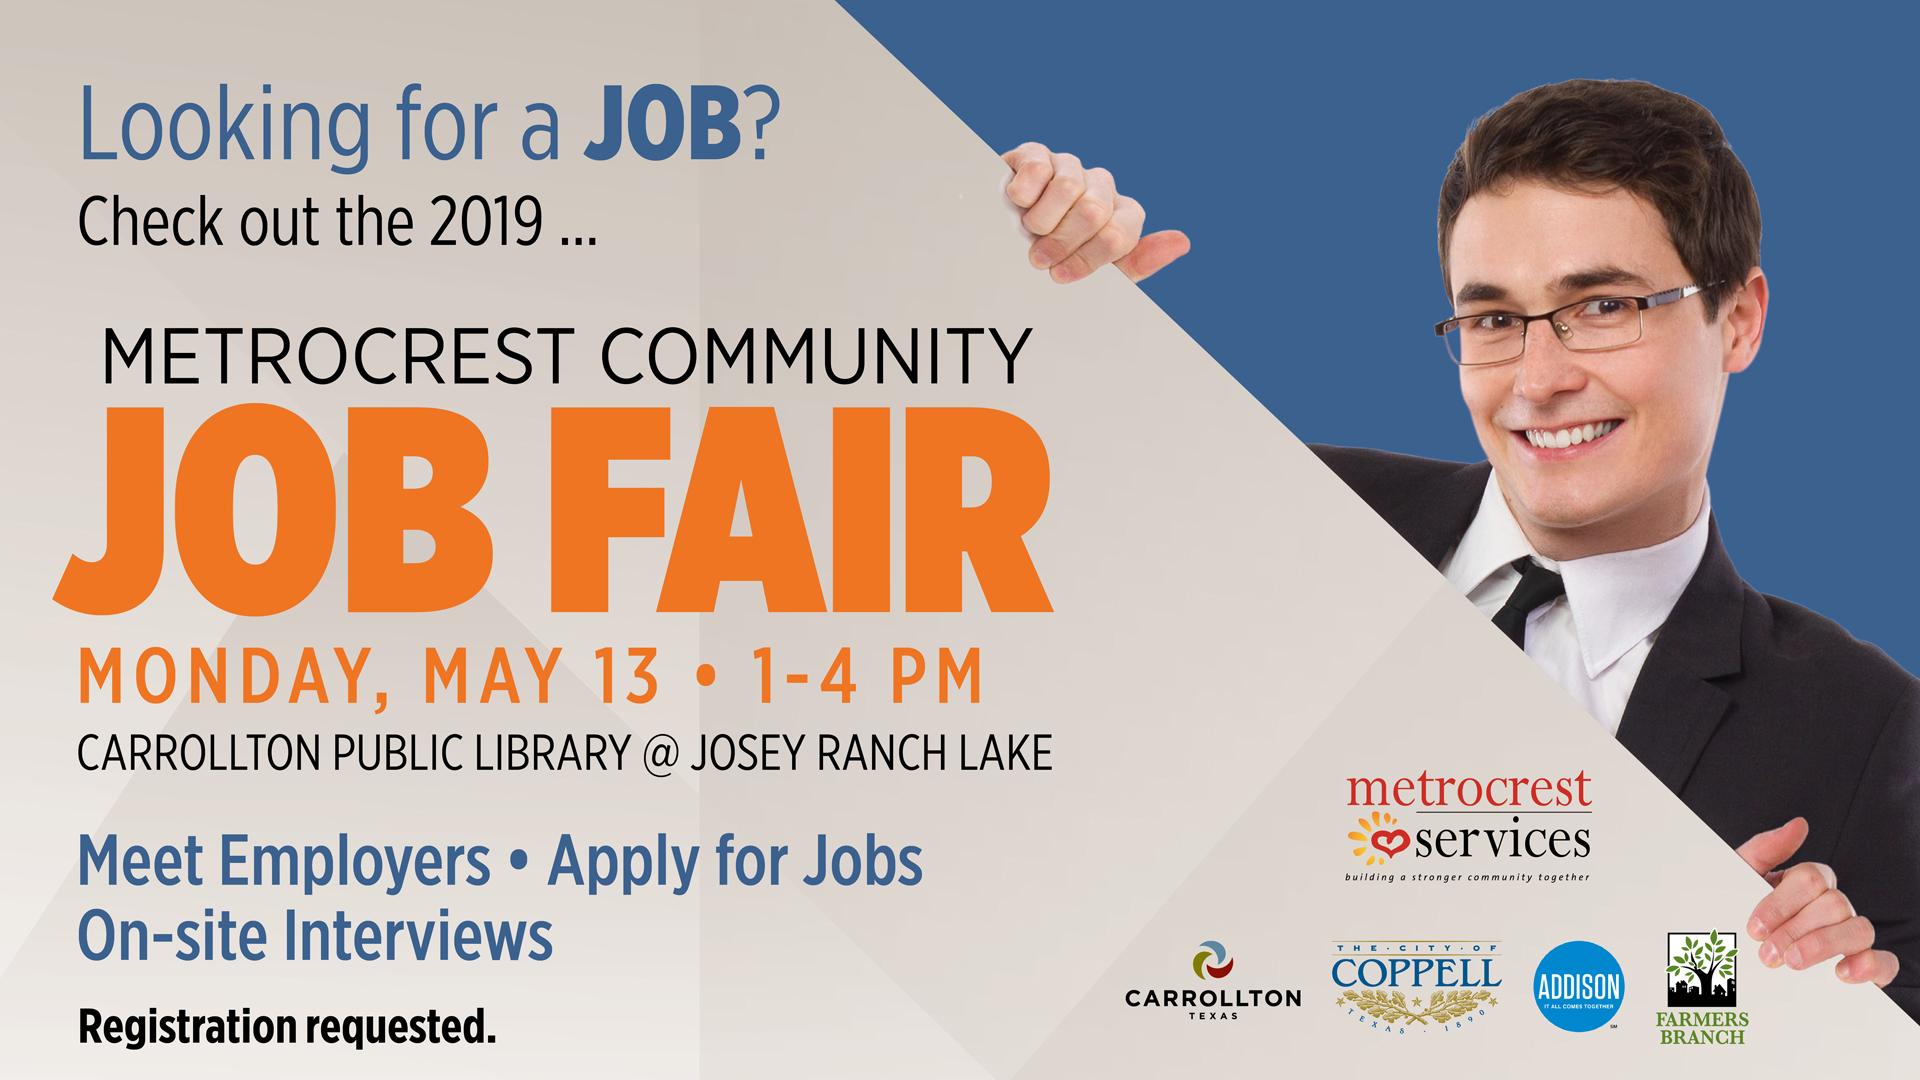 Metrocrest Community Job Fair